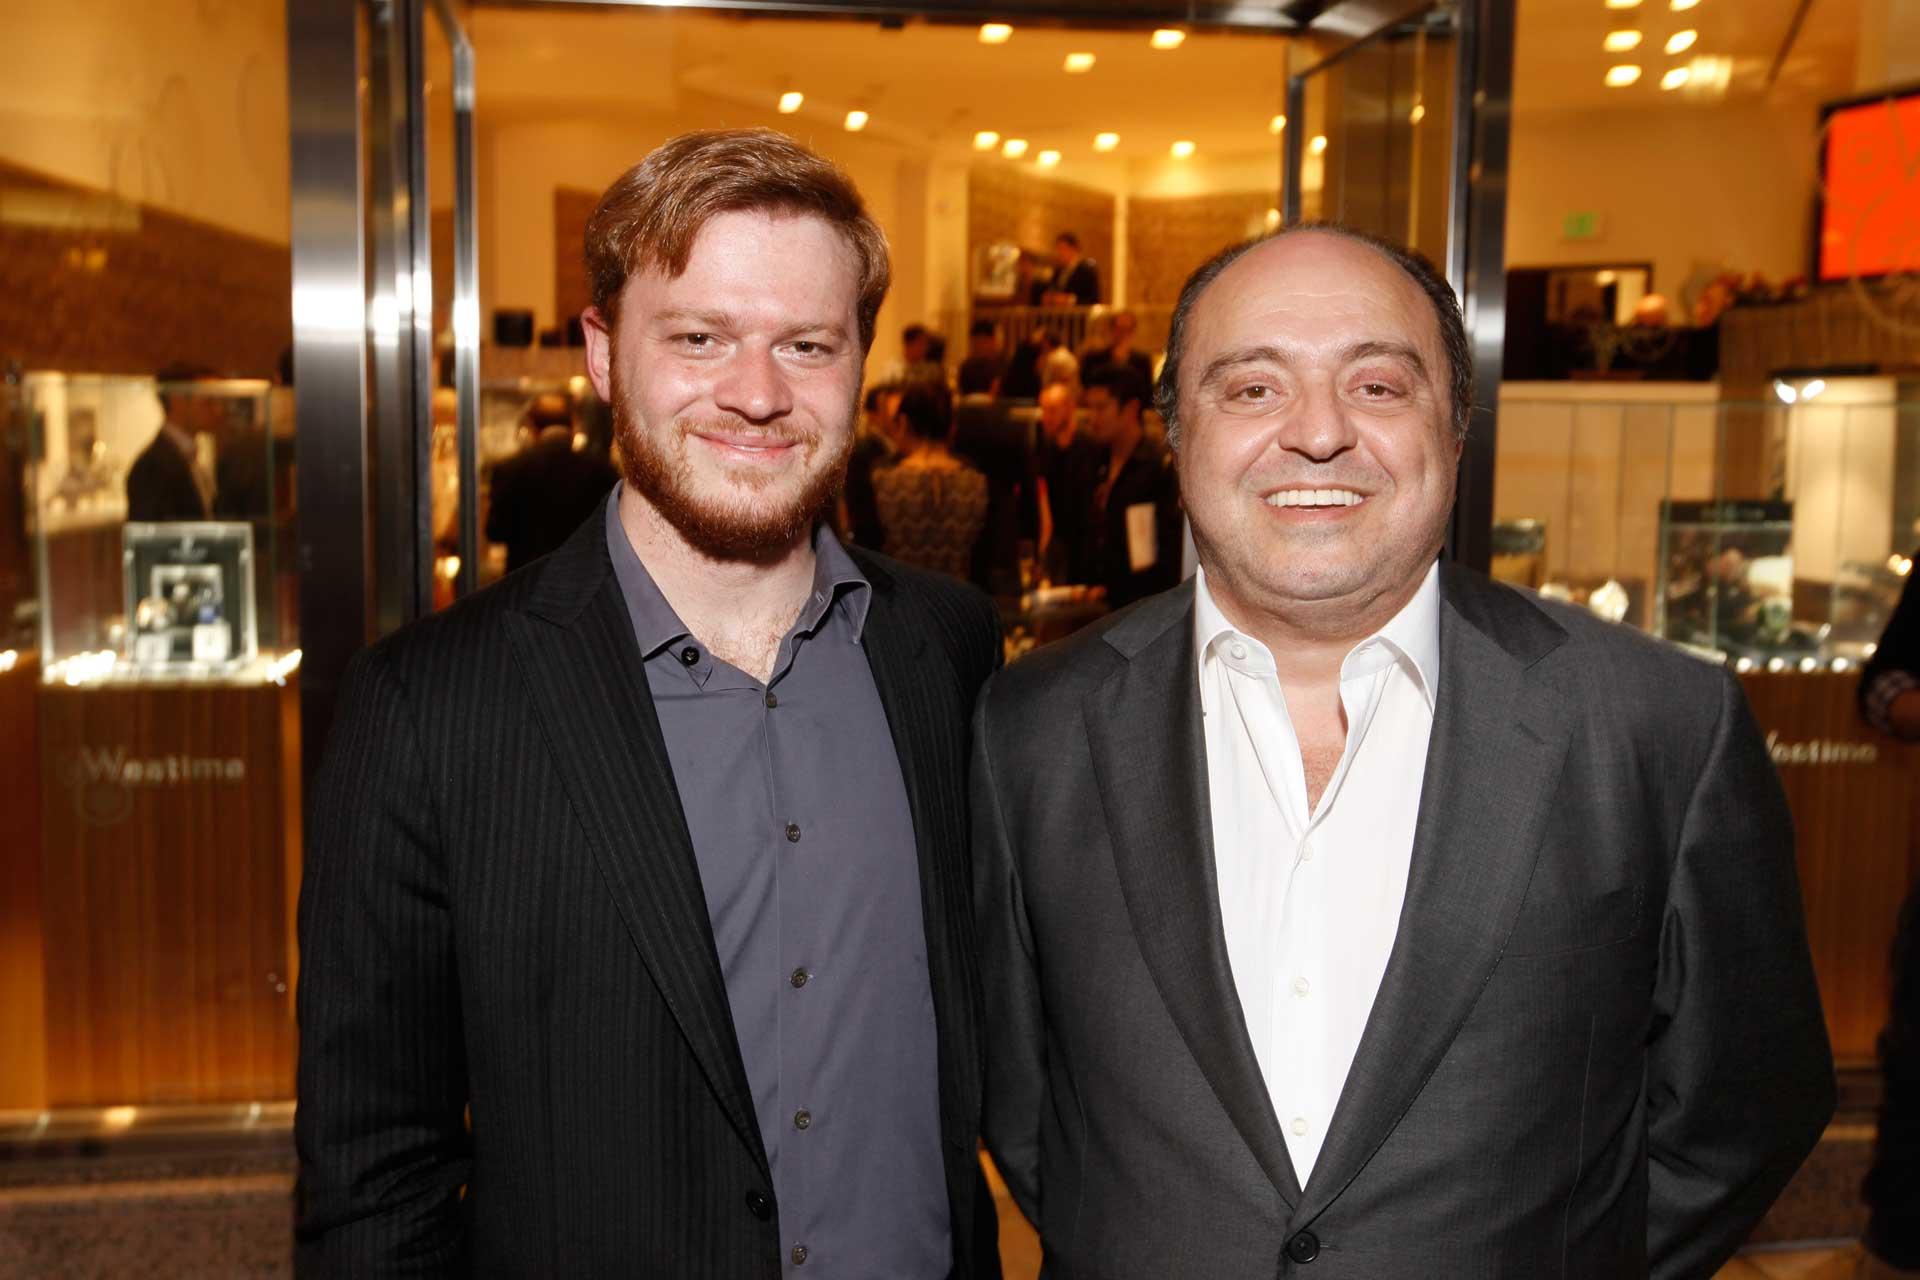 (L-R) Greg with his father, John Simonian